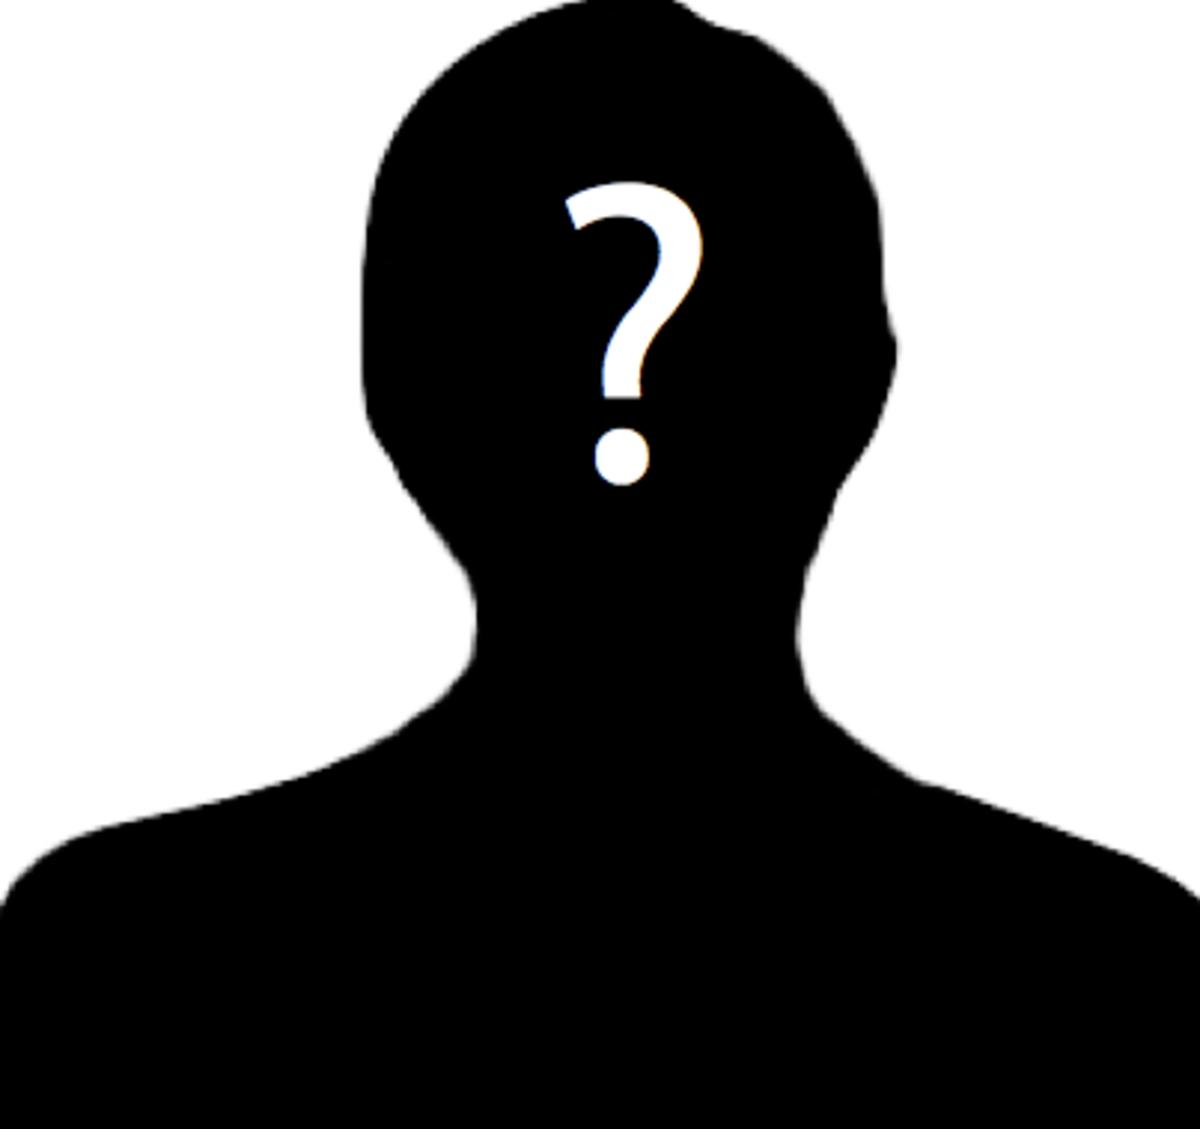 International man of mystery?